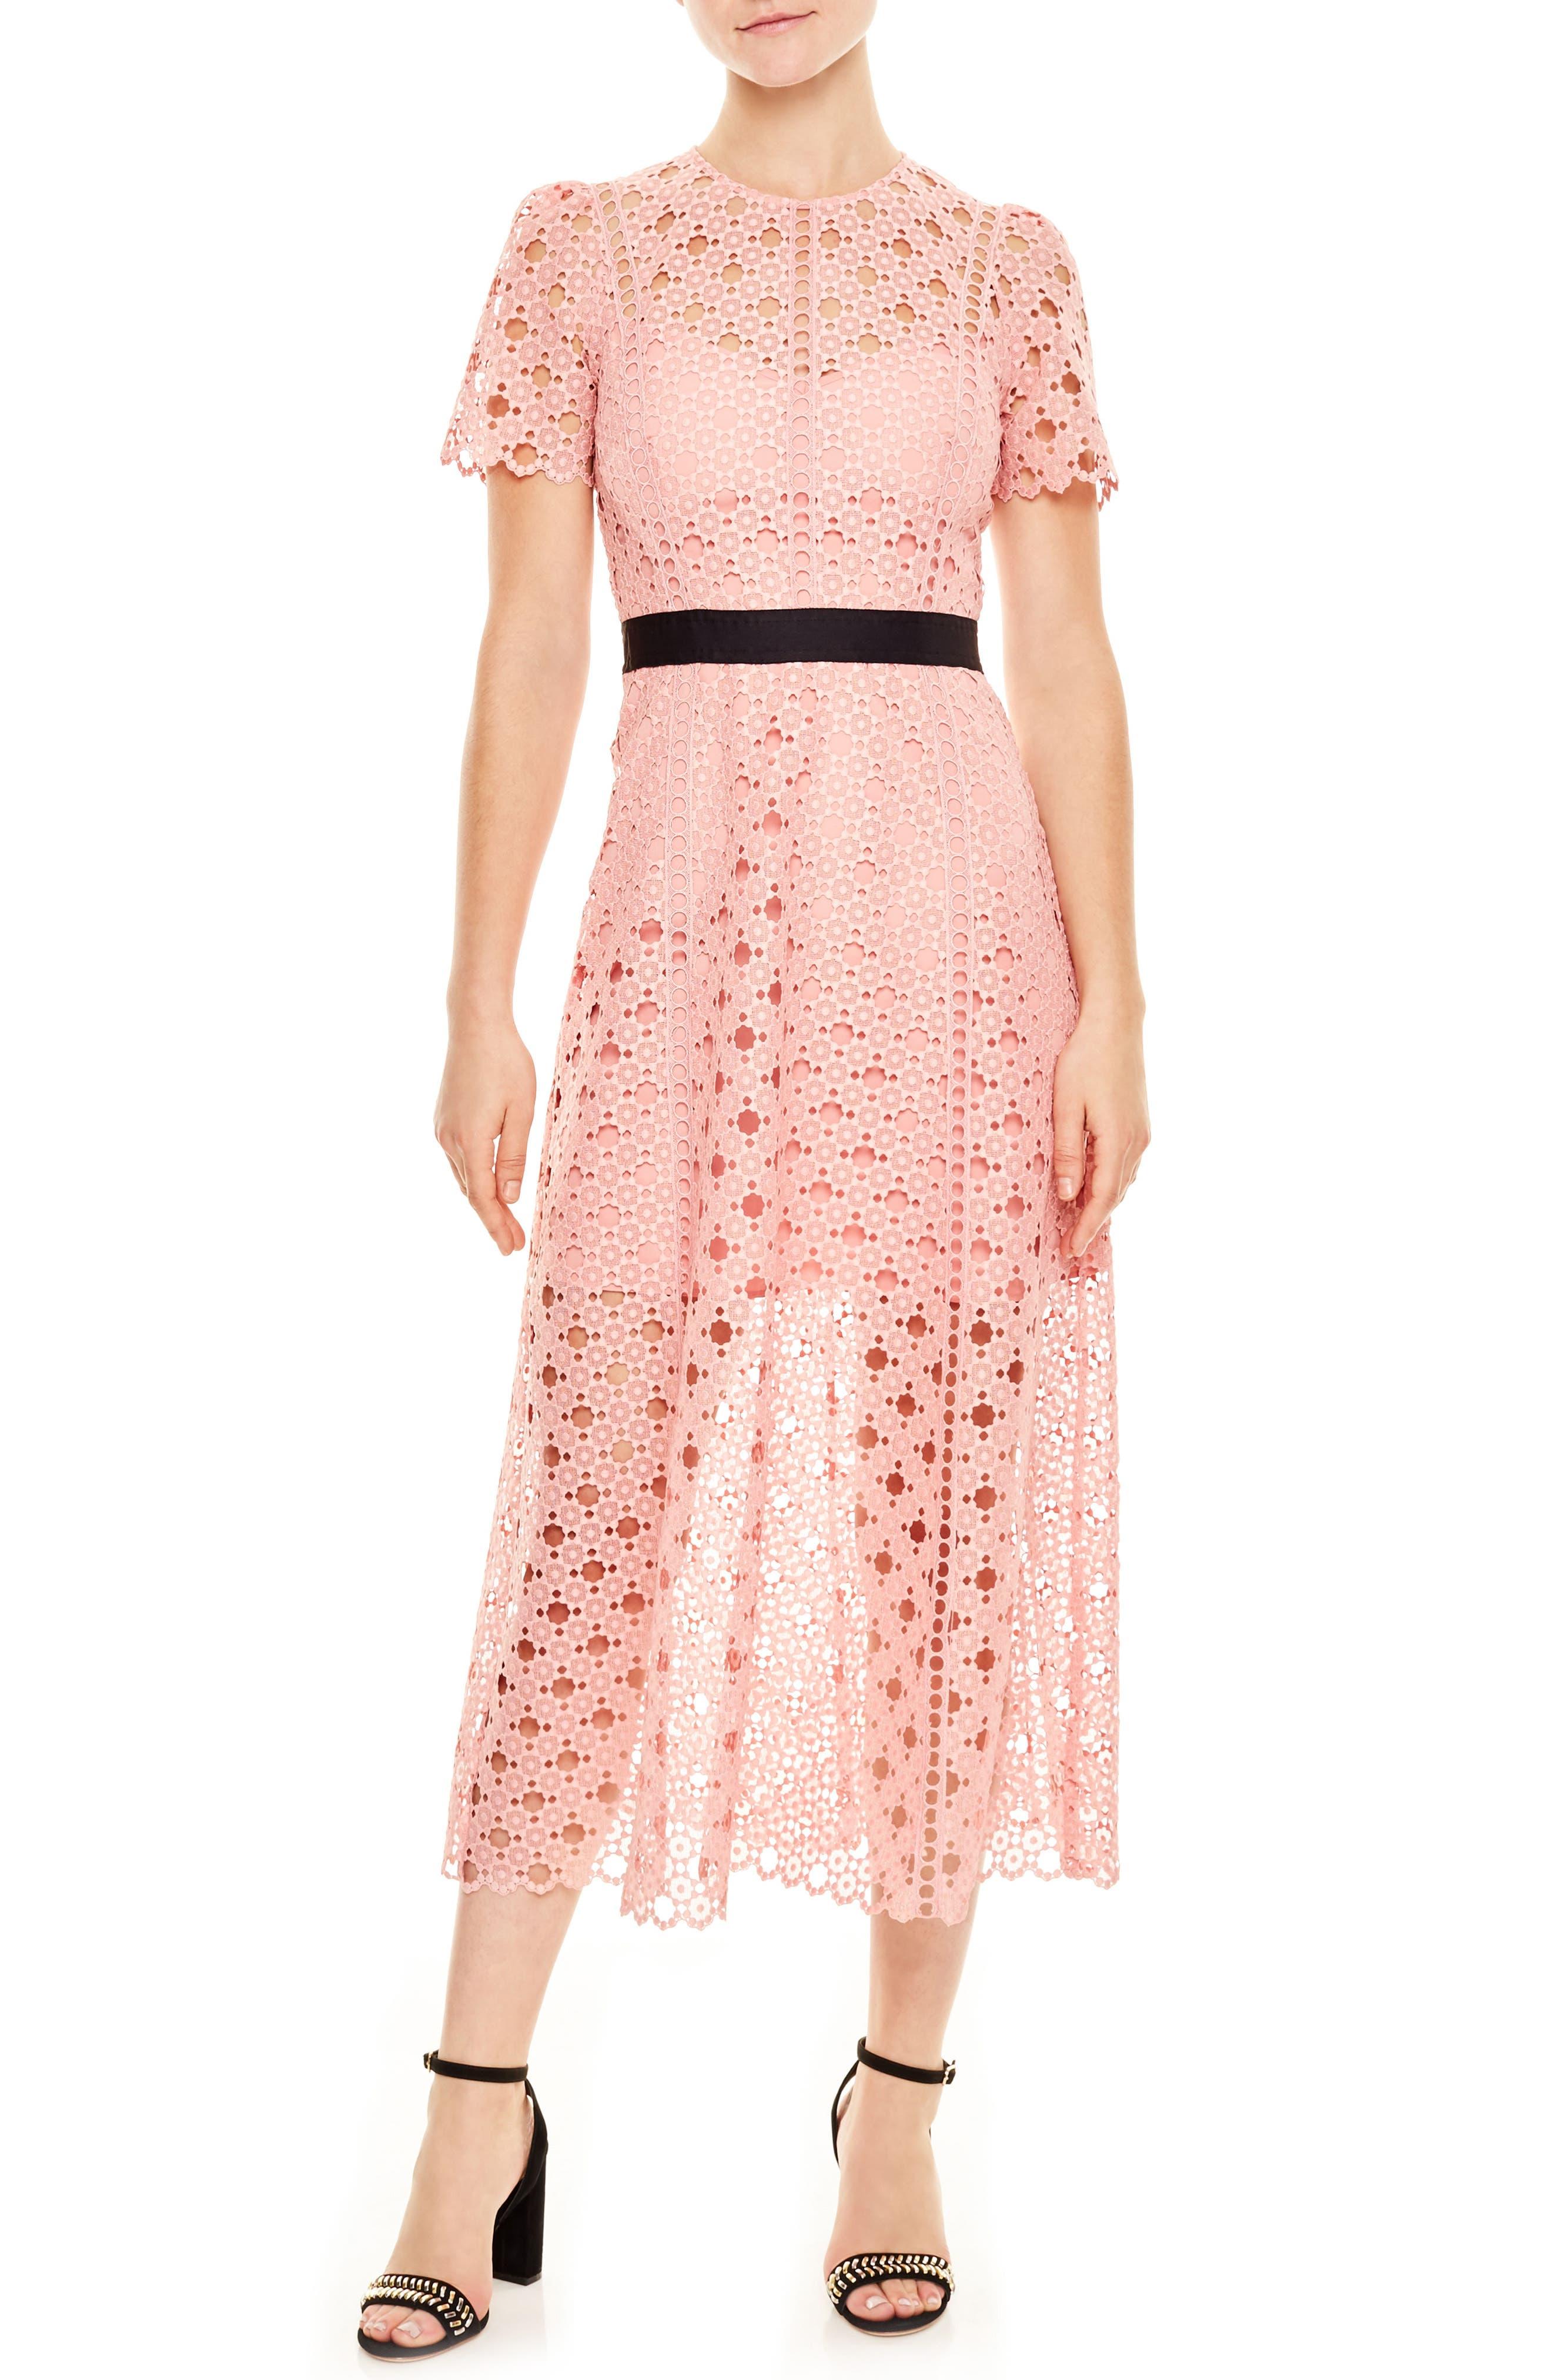 Alternate Image 1 Selected - sandro Pivoine Eyelet Lace Dress